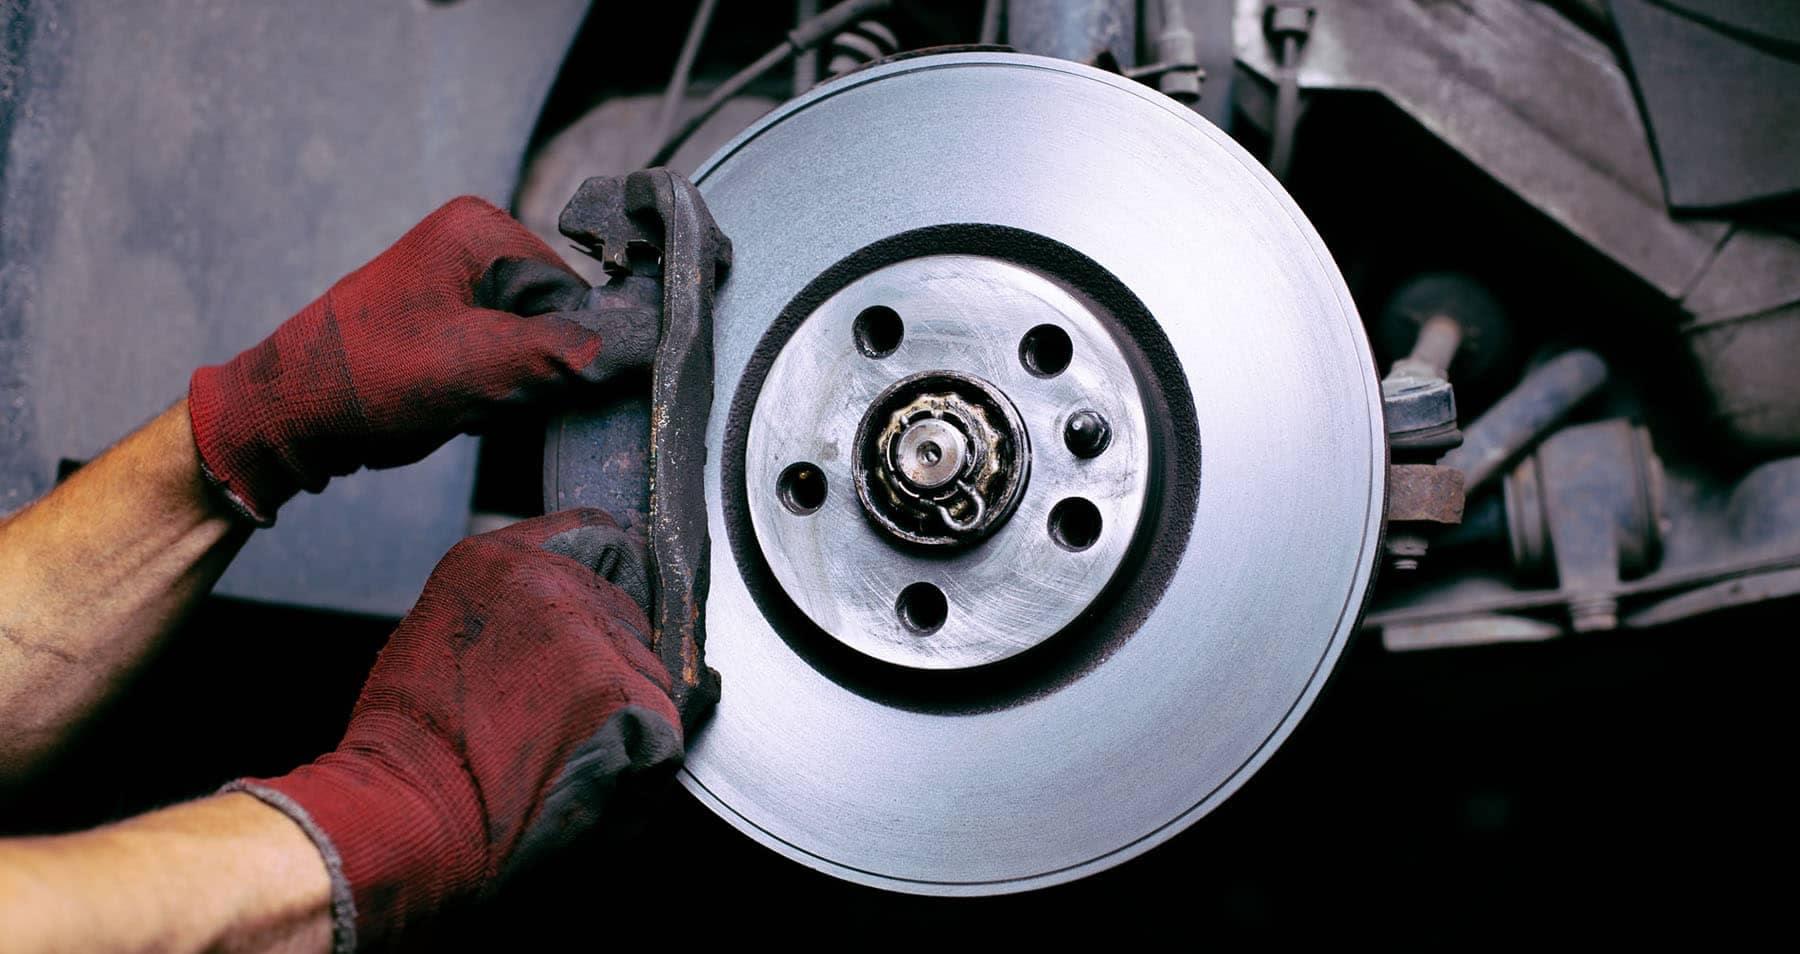 parts brake pad being replaced